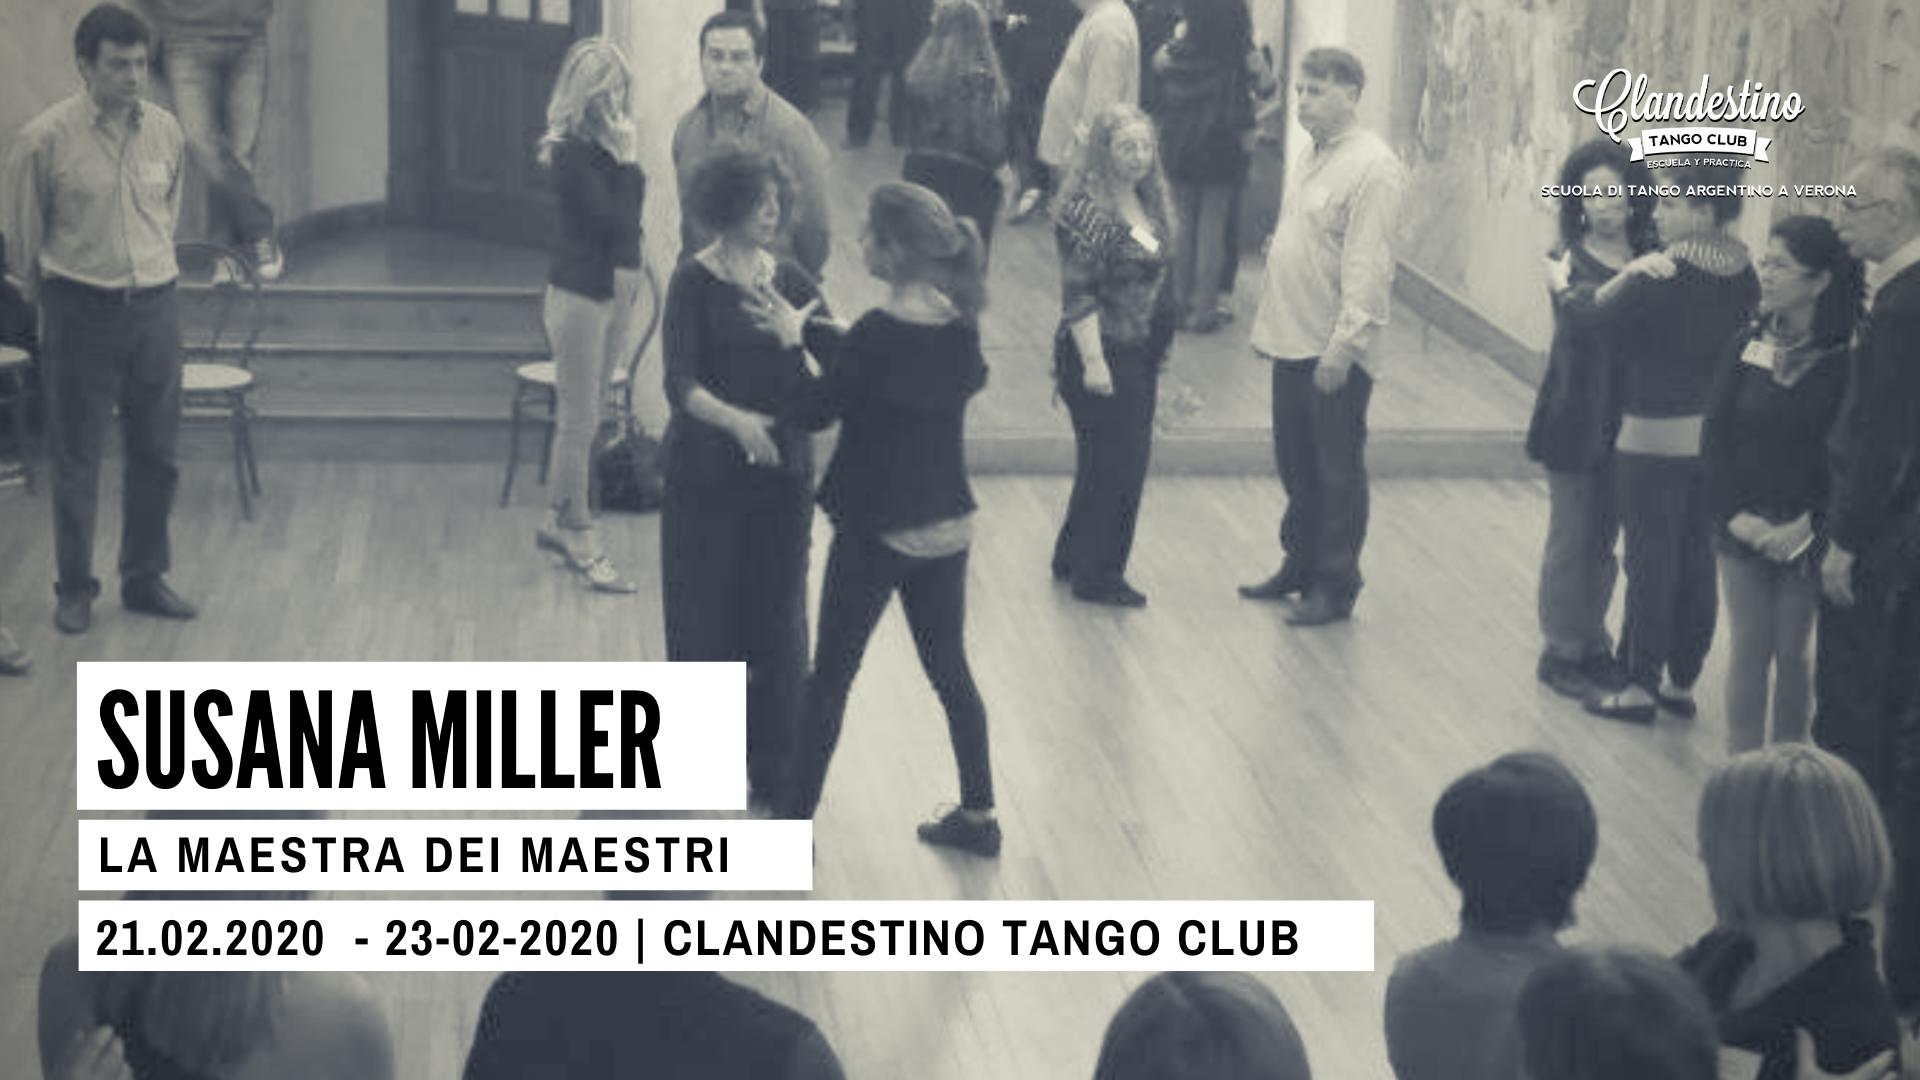 Clandestino tango club - Susana Miller